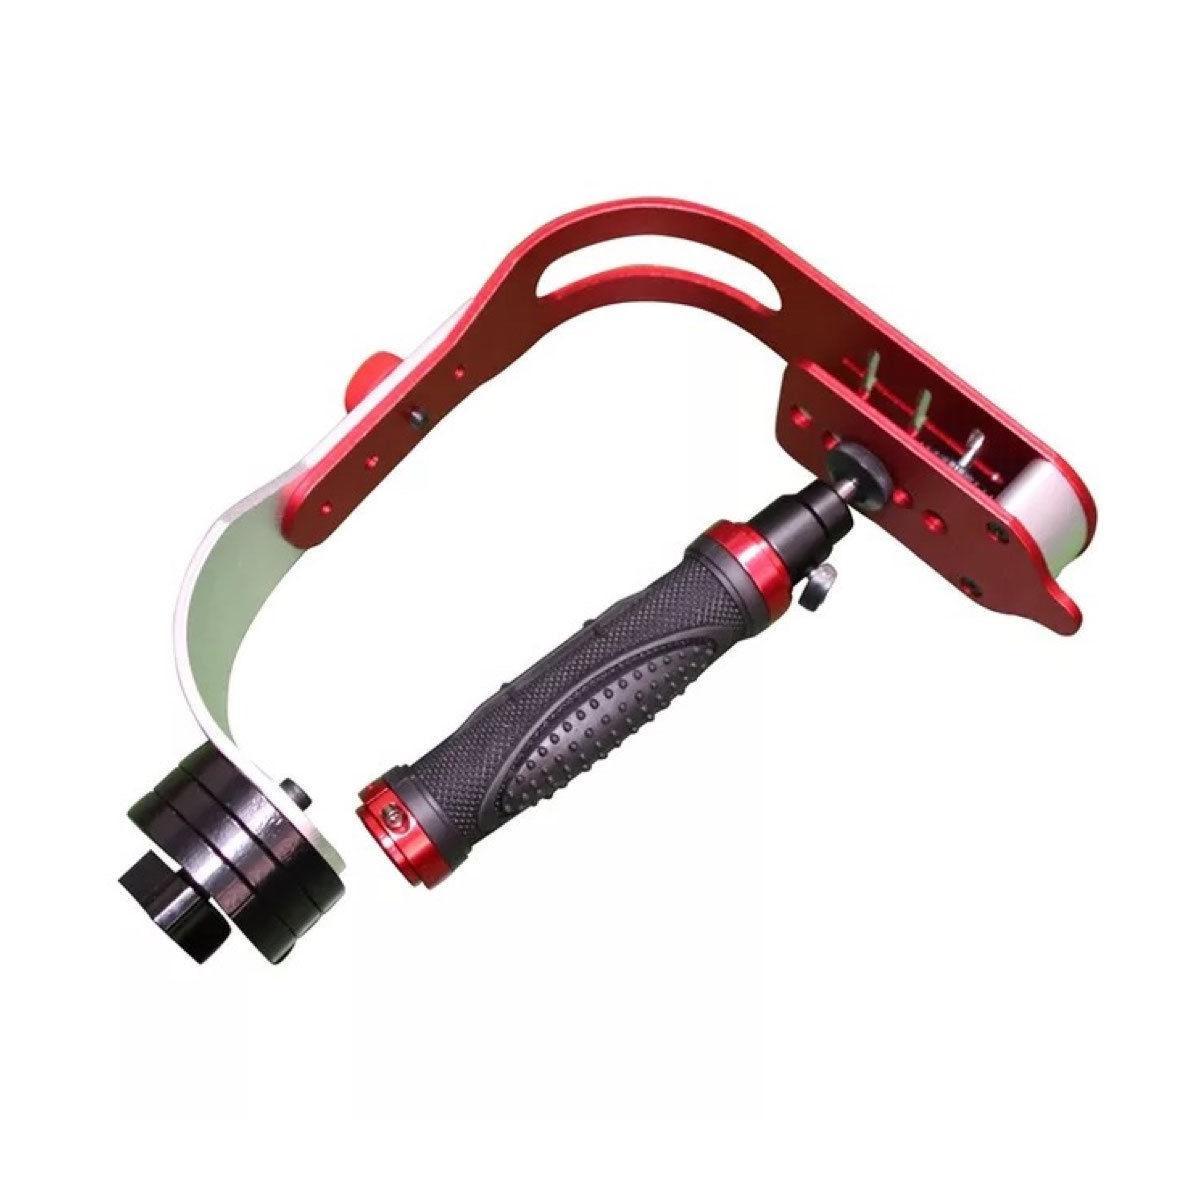 Smartphone Video Lightweight Camera Rig Handheld Stabilizer